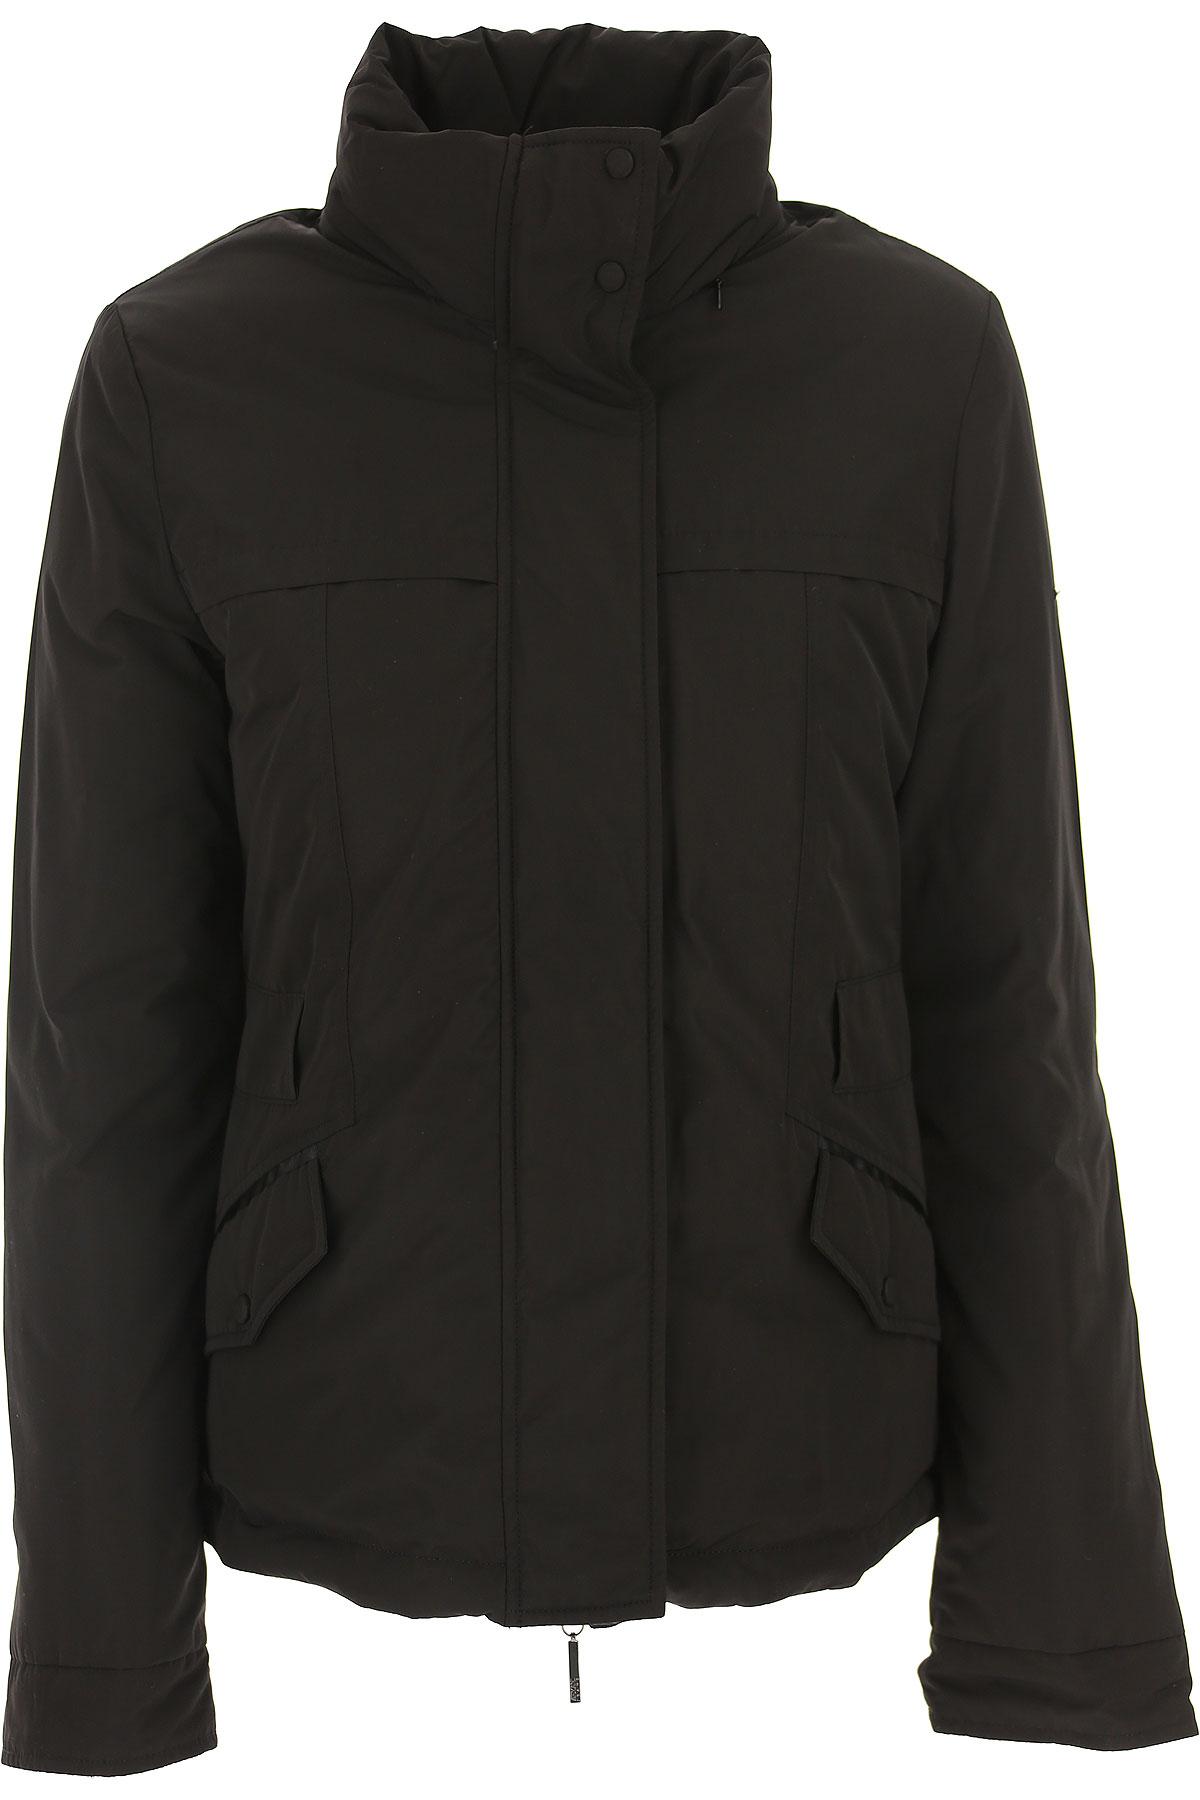 Image of Giorgio Armani Down Jacket for Women, Puffer Ski Jacket On Sale, Black, polyester, 2017, 10 4 6 8